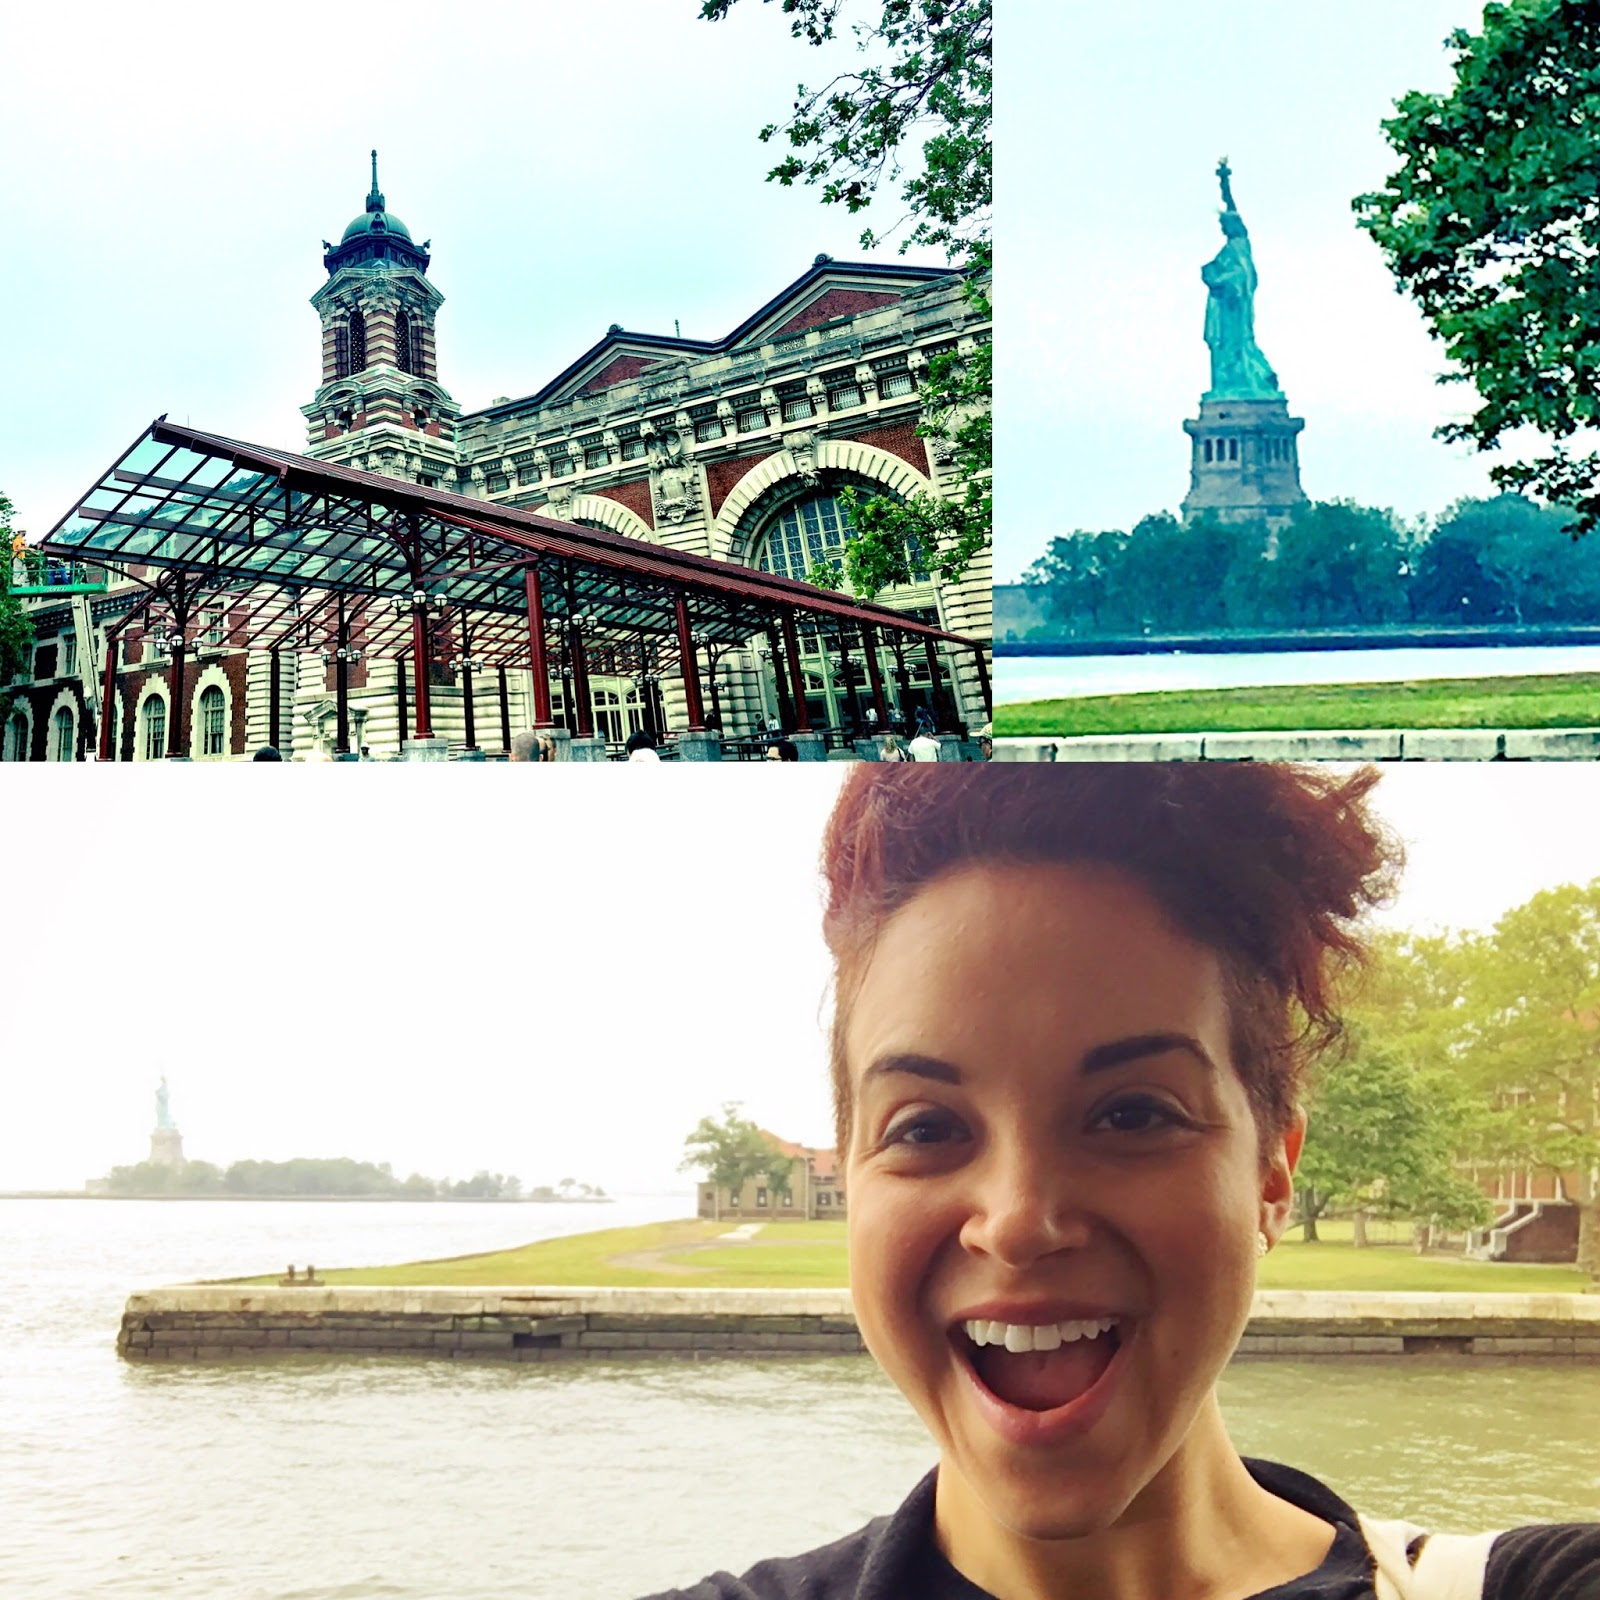 Ellis Island Er